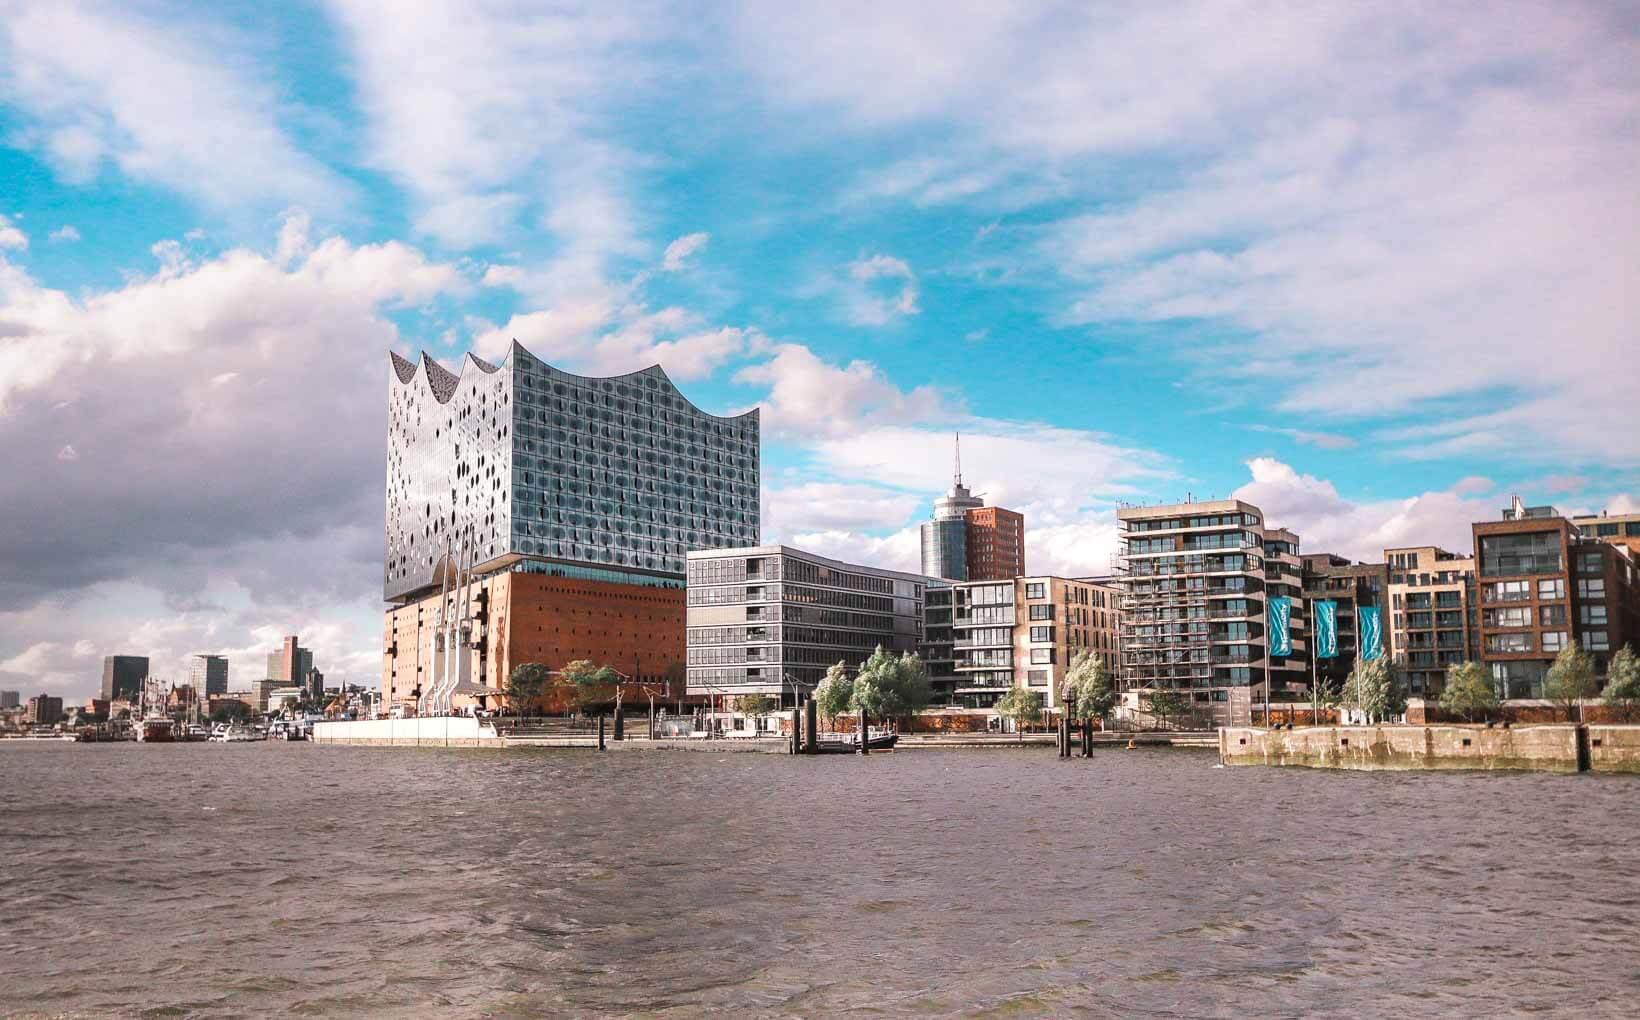 Elbphilharmonie Hamburg. How to Visit Reeperbahn Clubs Festival Like a Pro